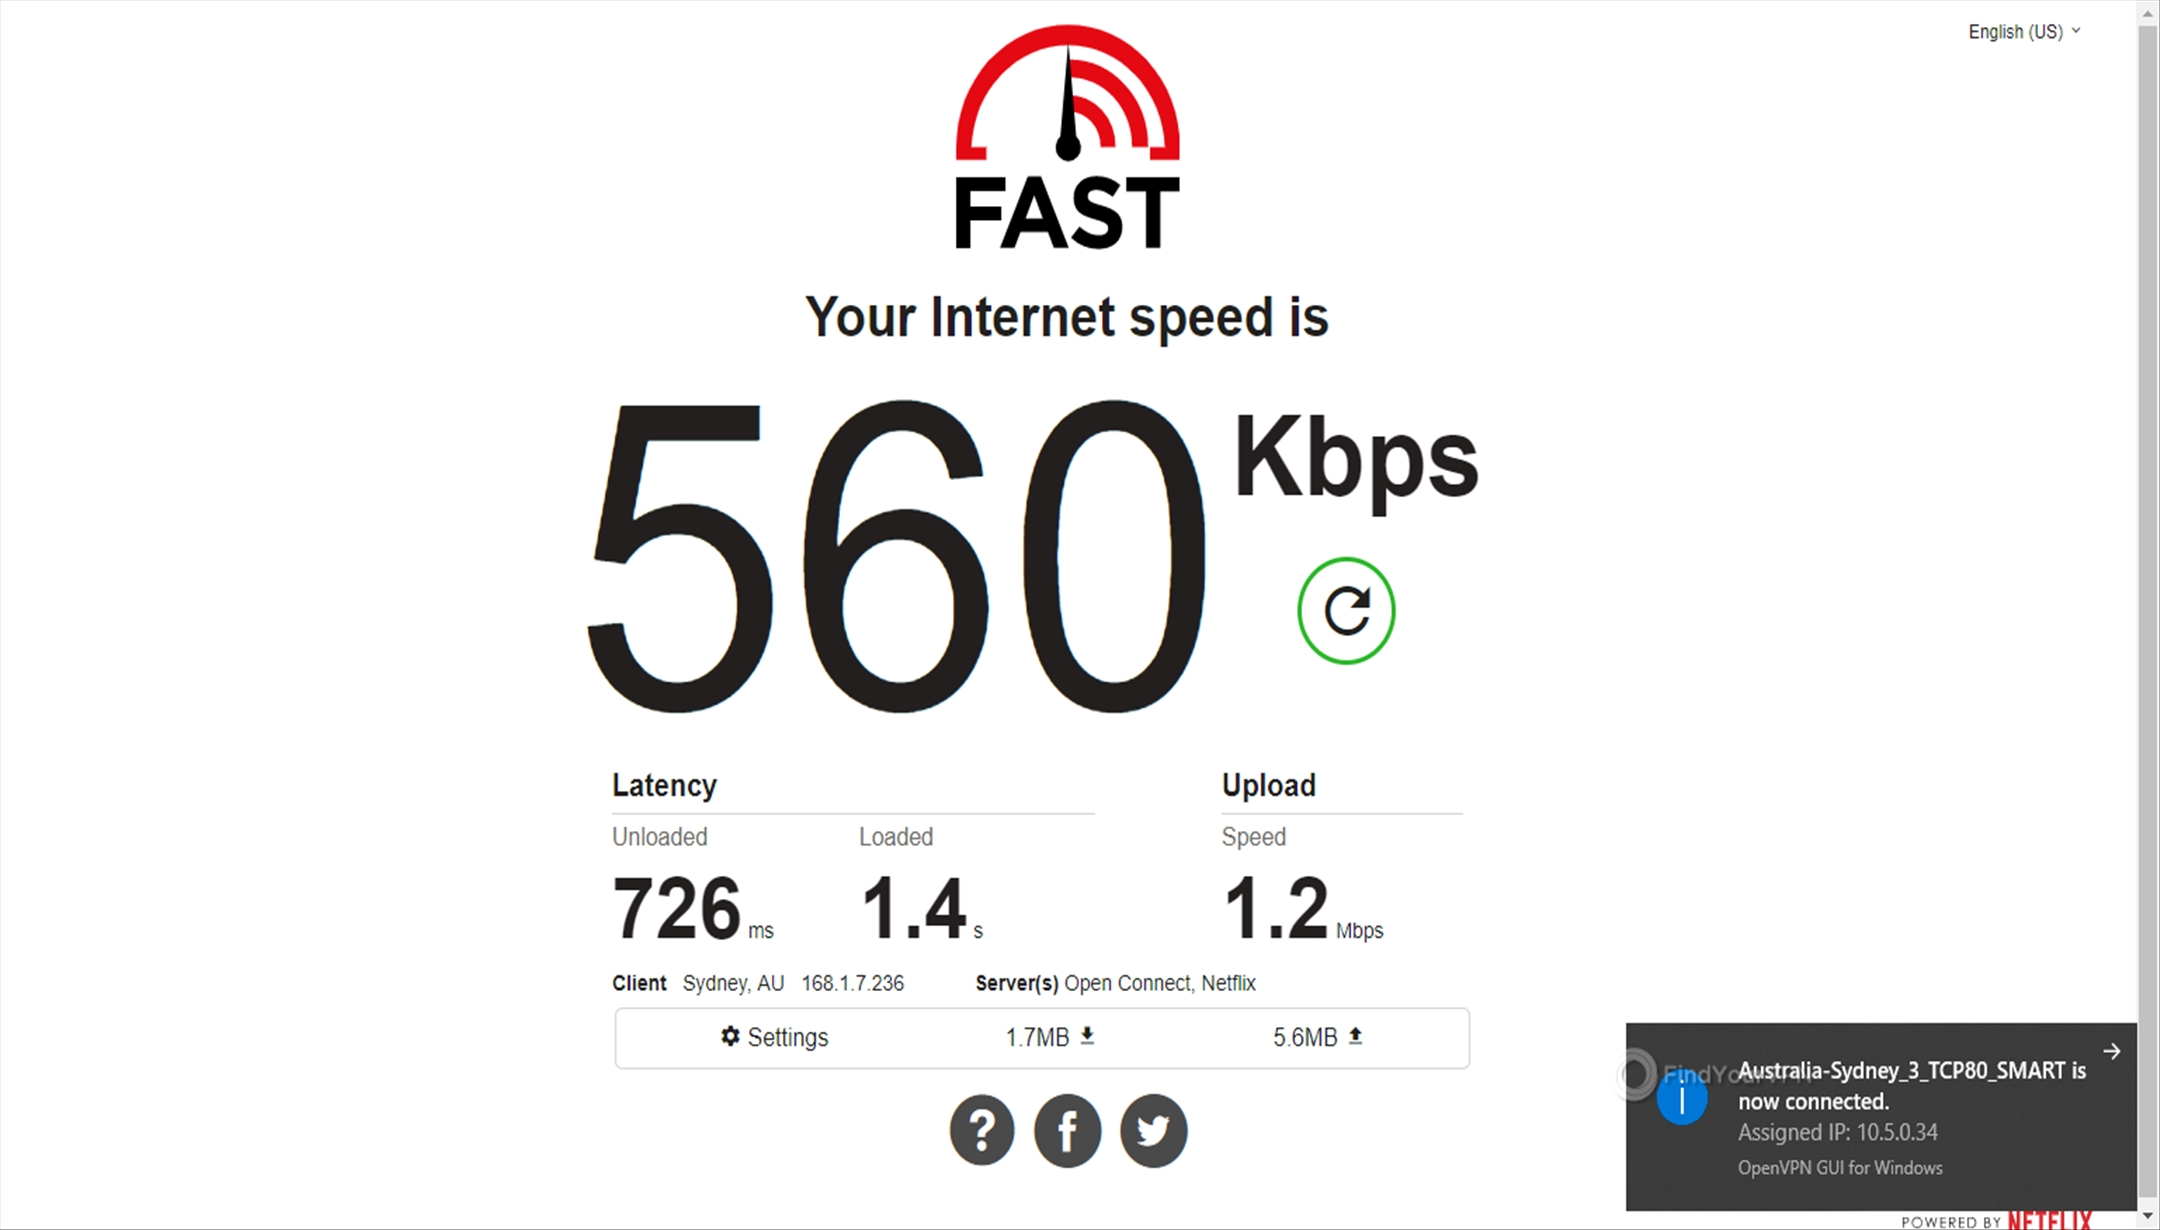 Getflix Australia 560 Kbps speed